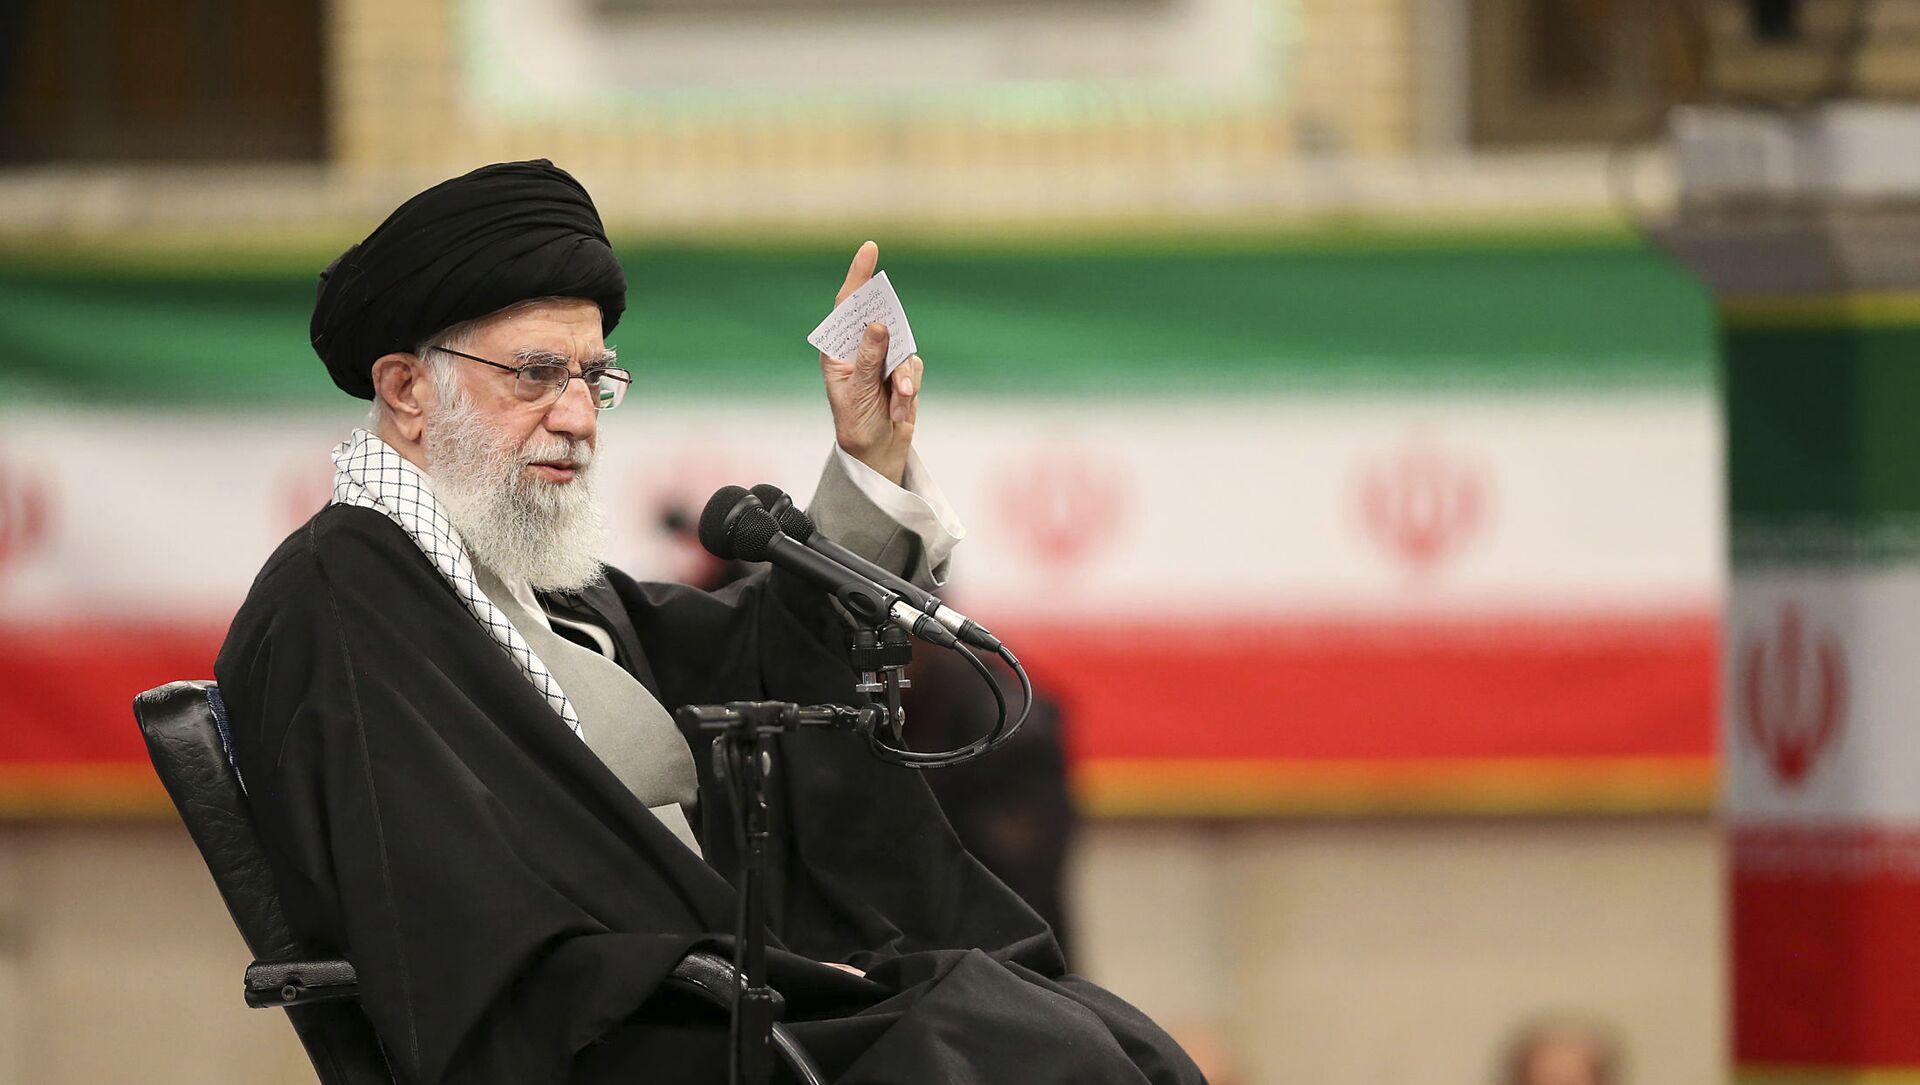 l'ayatollah Ali Khamenei - Sputnik France, 1920, 21.03.2021